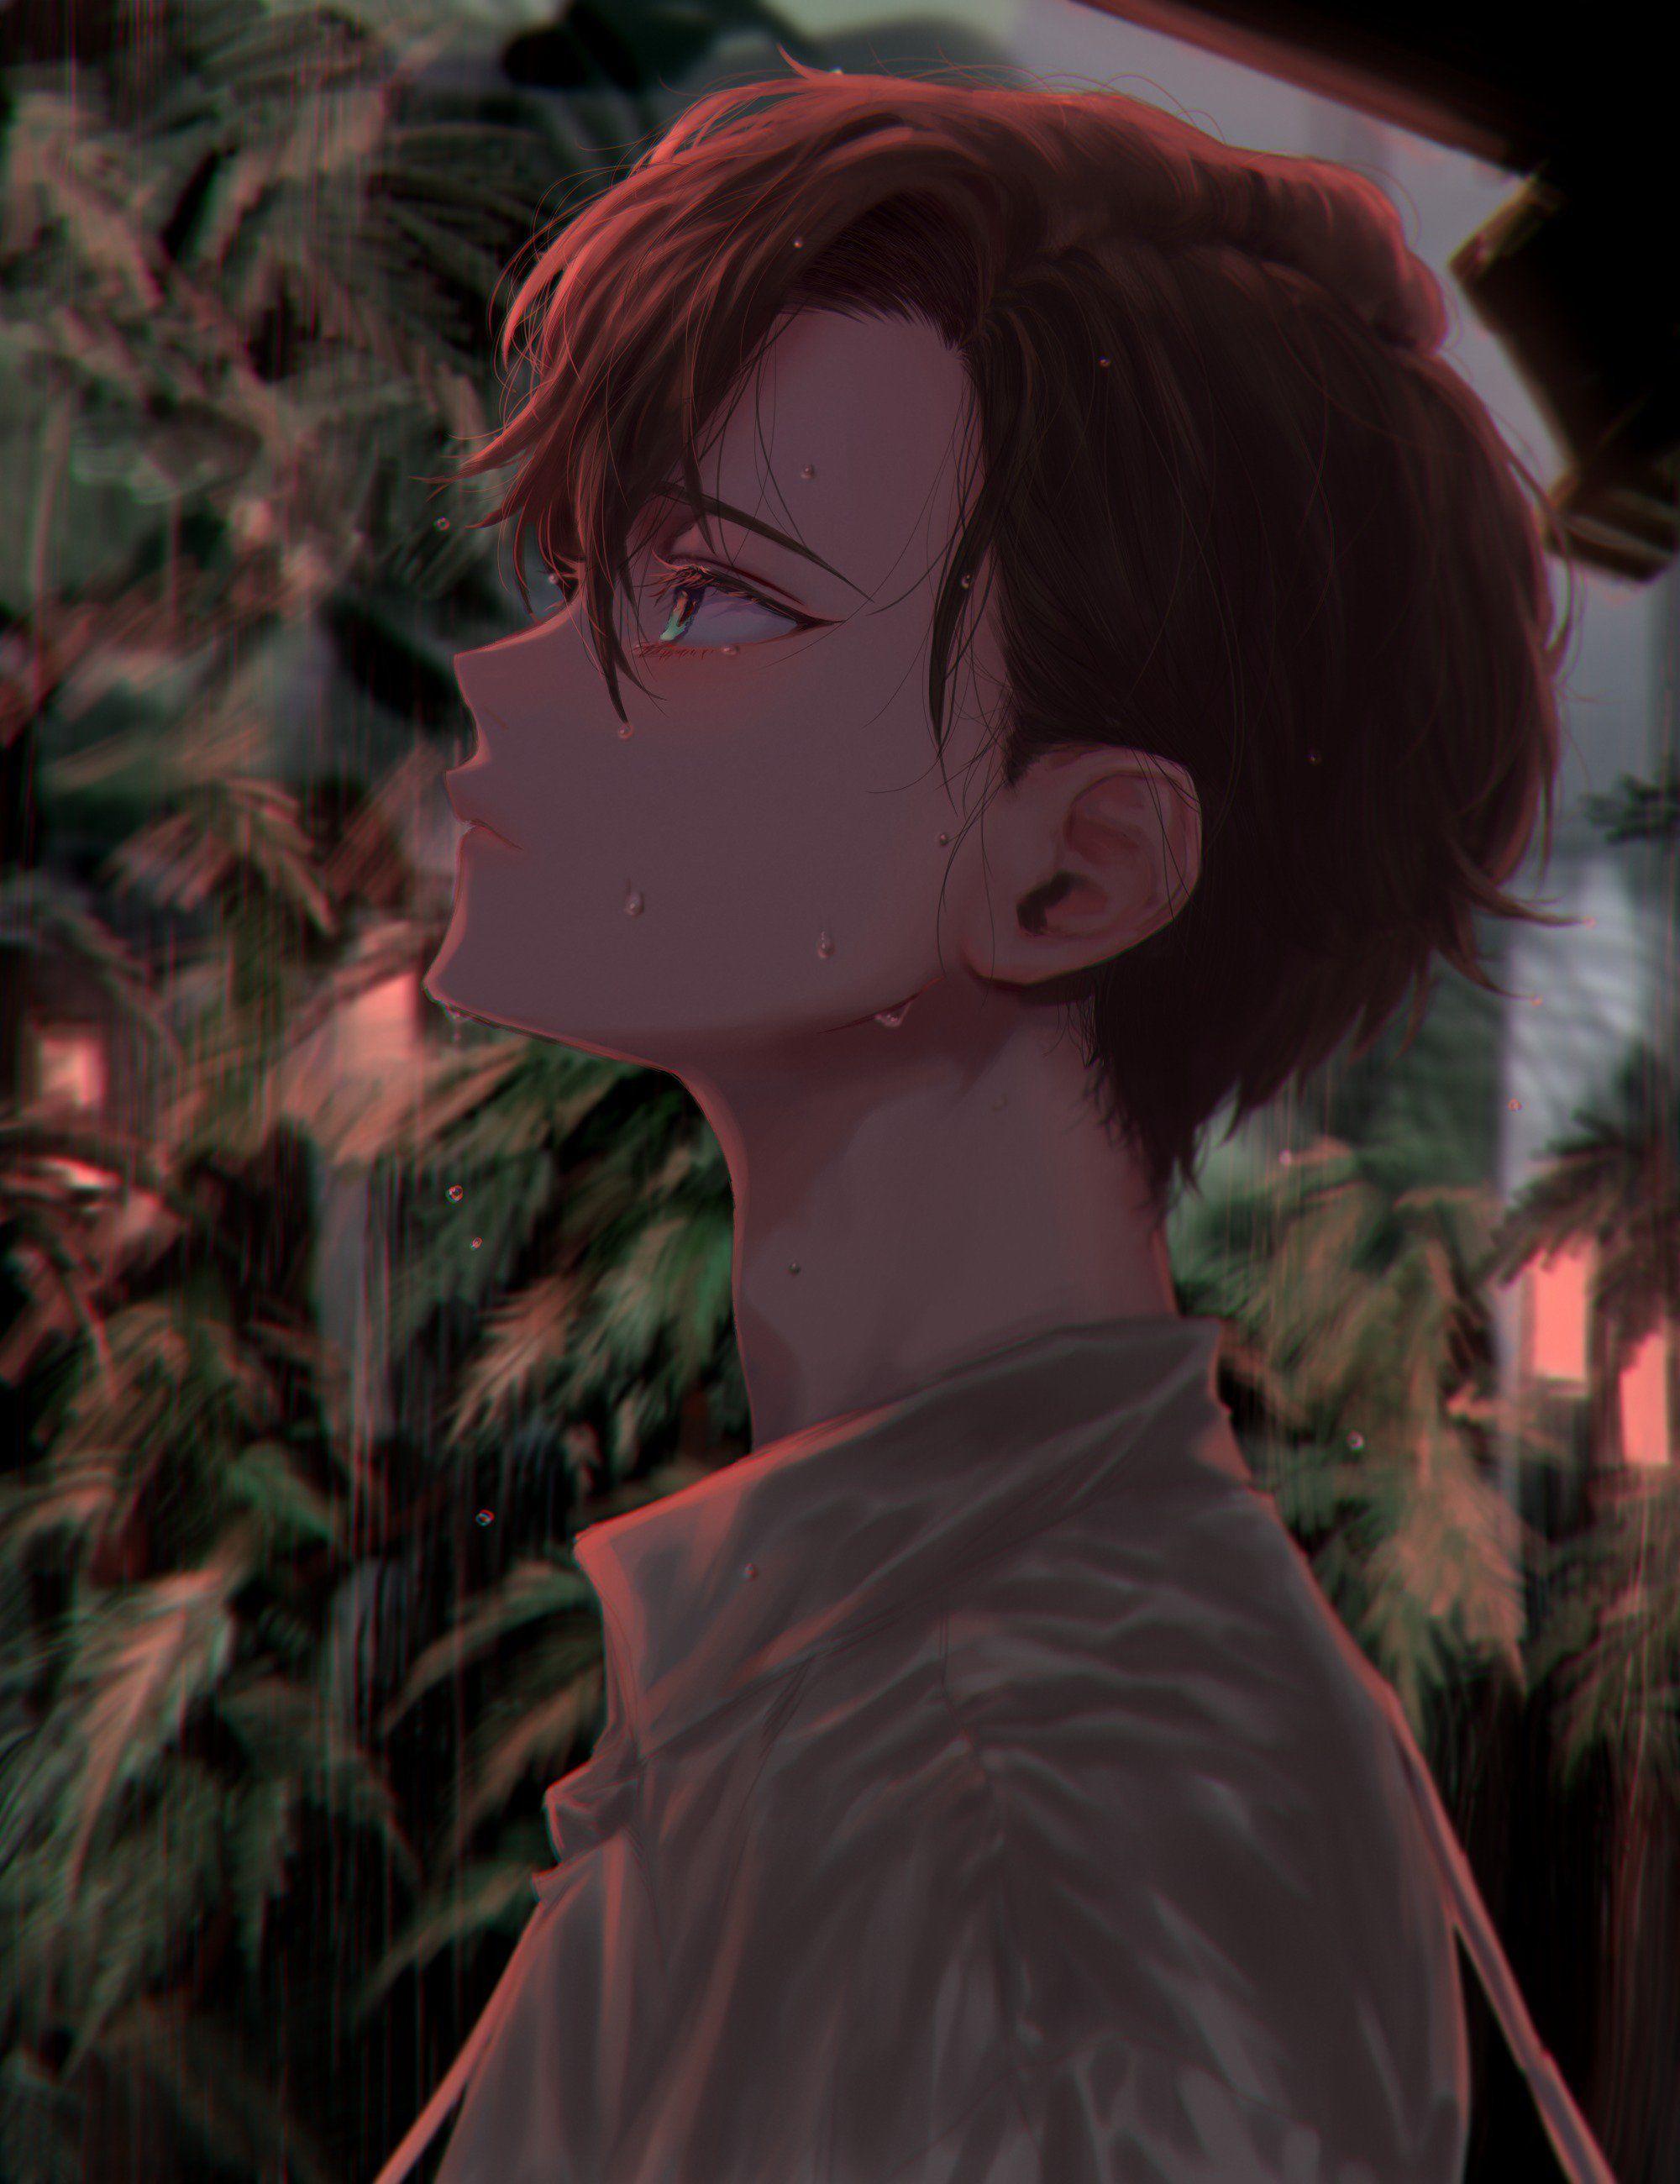 Pin By Qeilla On Moon Anime Drawings Boy Cute Anime Boy Anime Boy